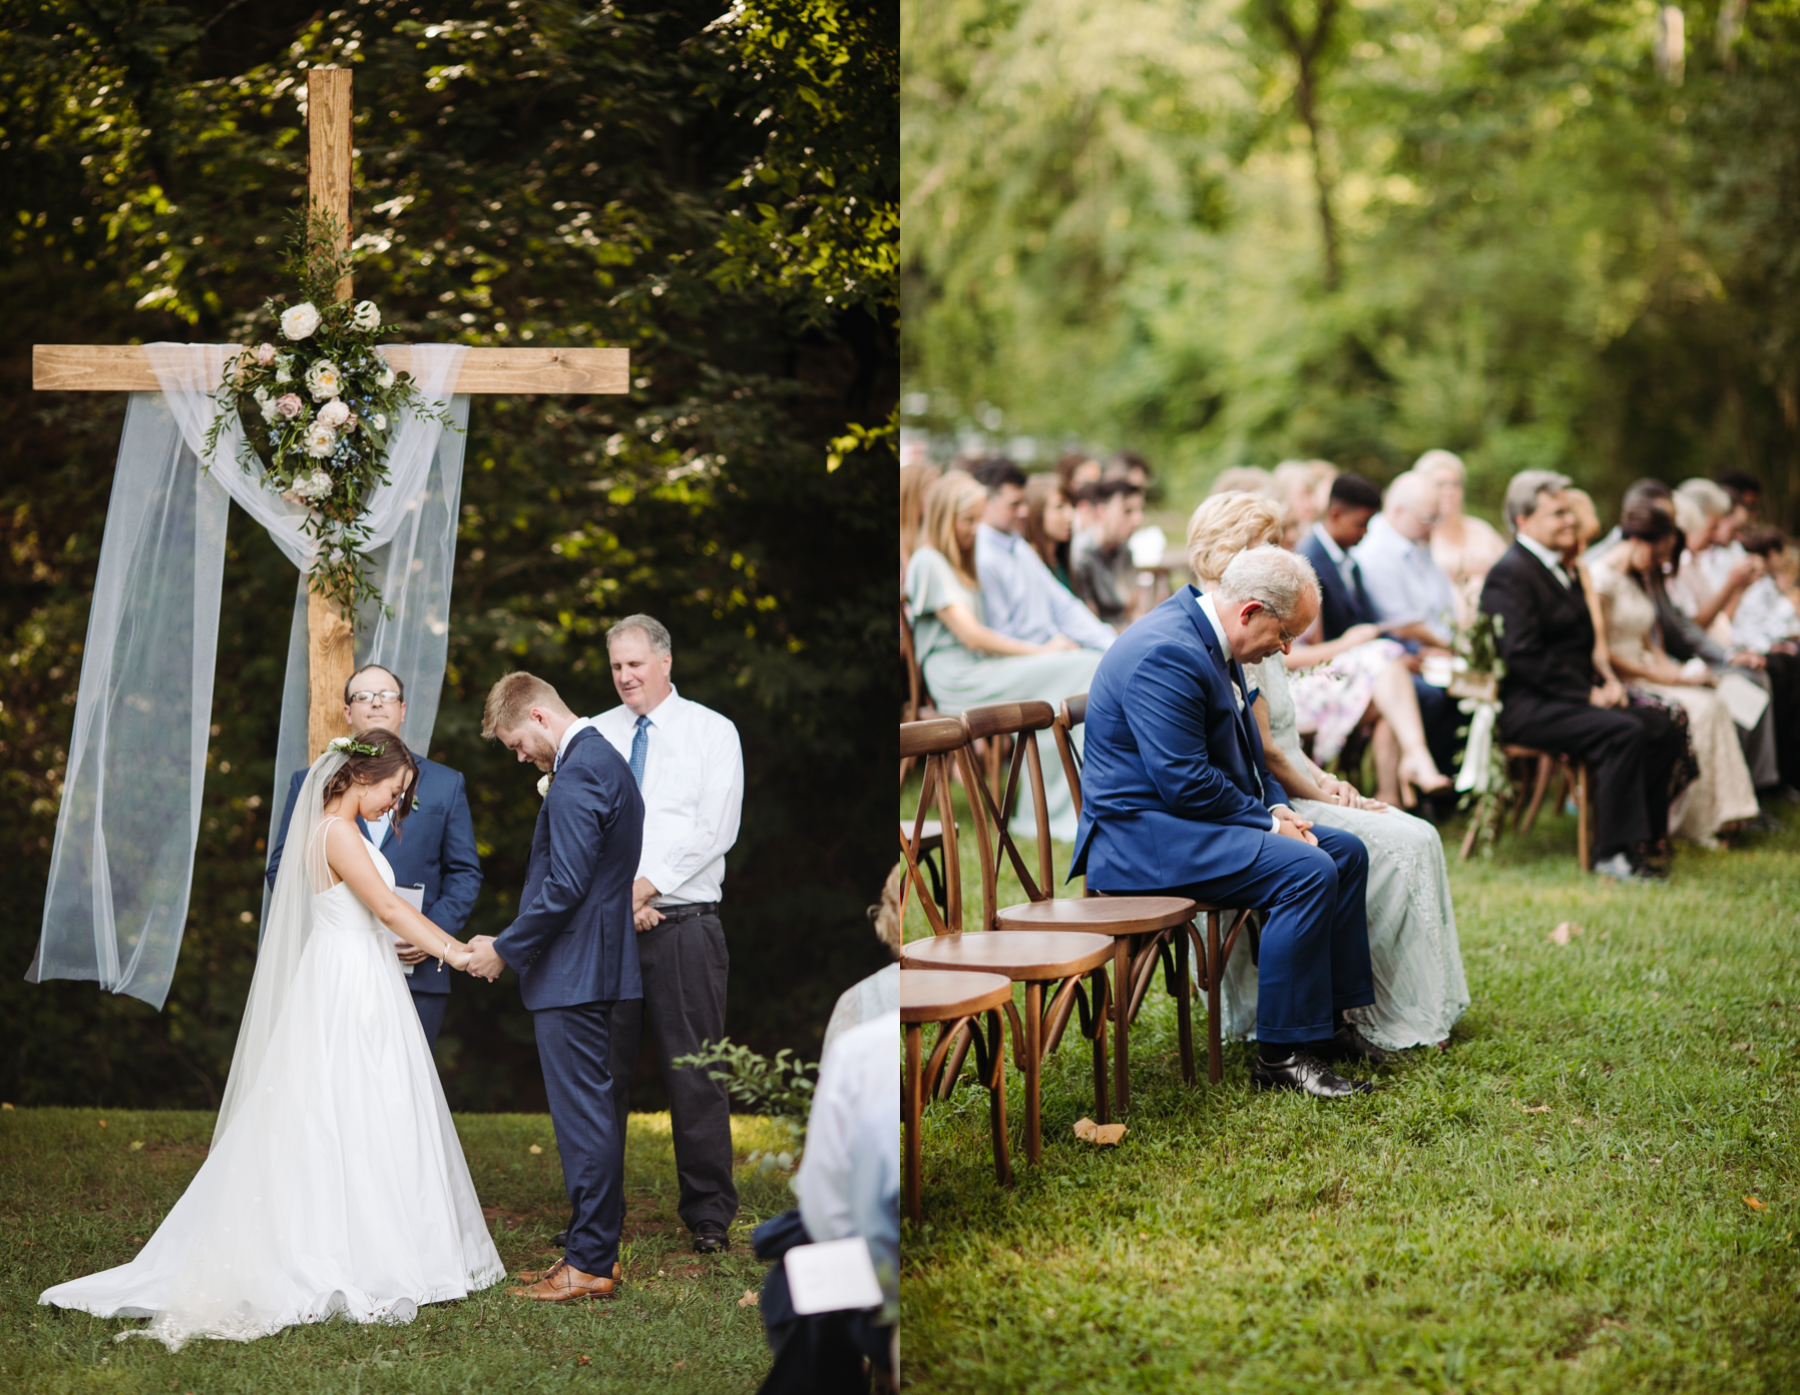 daras-garden-wedding-9.jpg